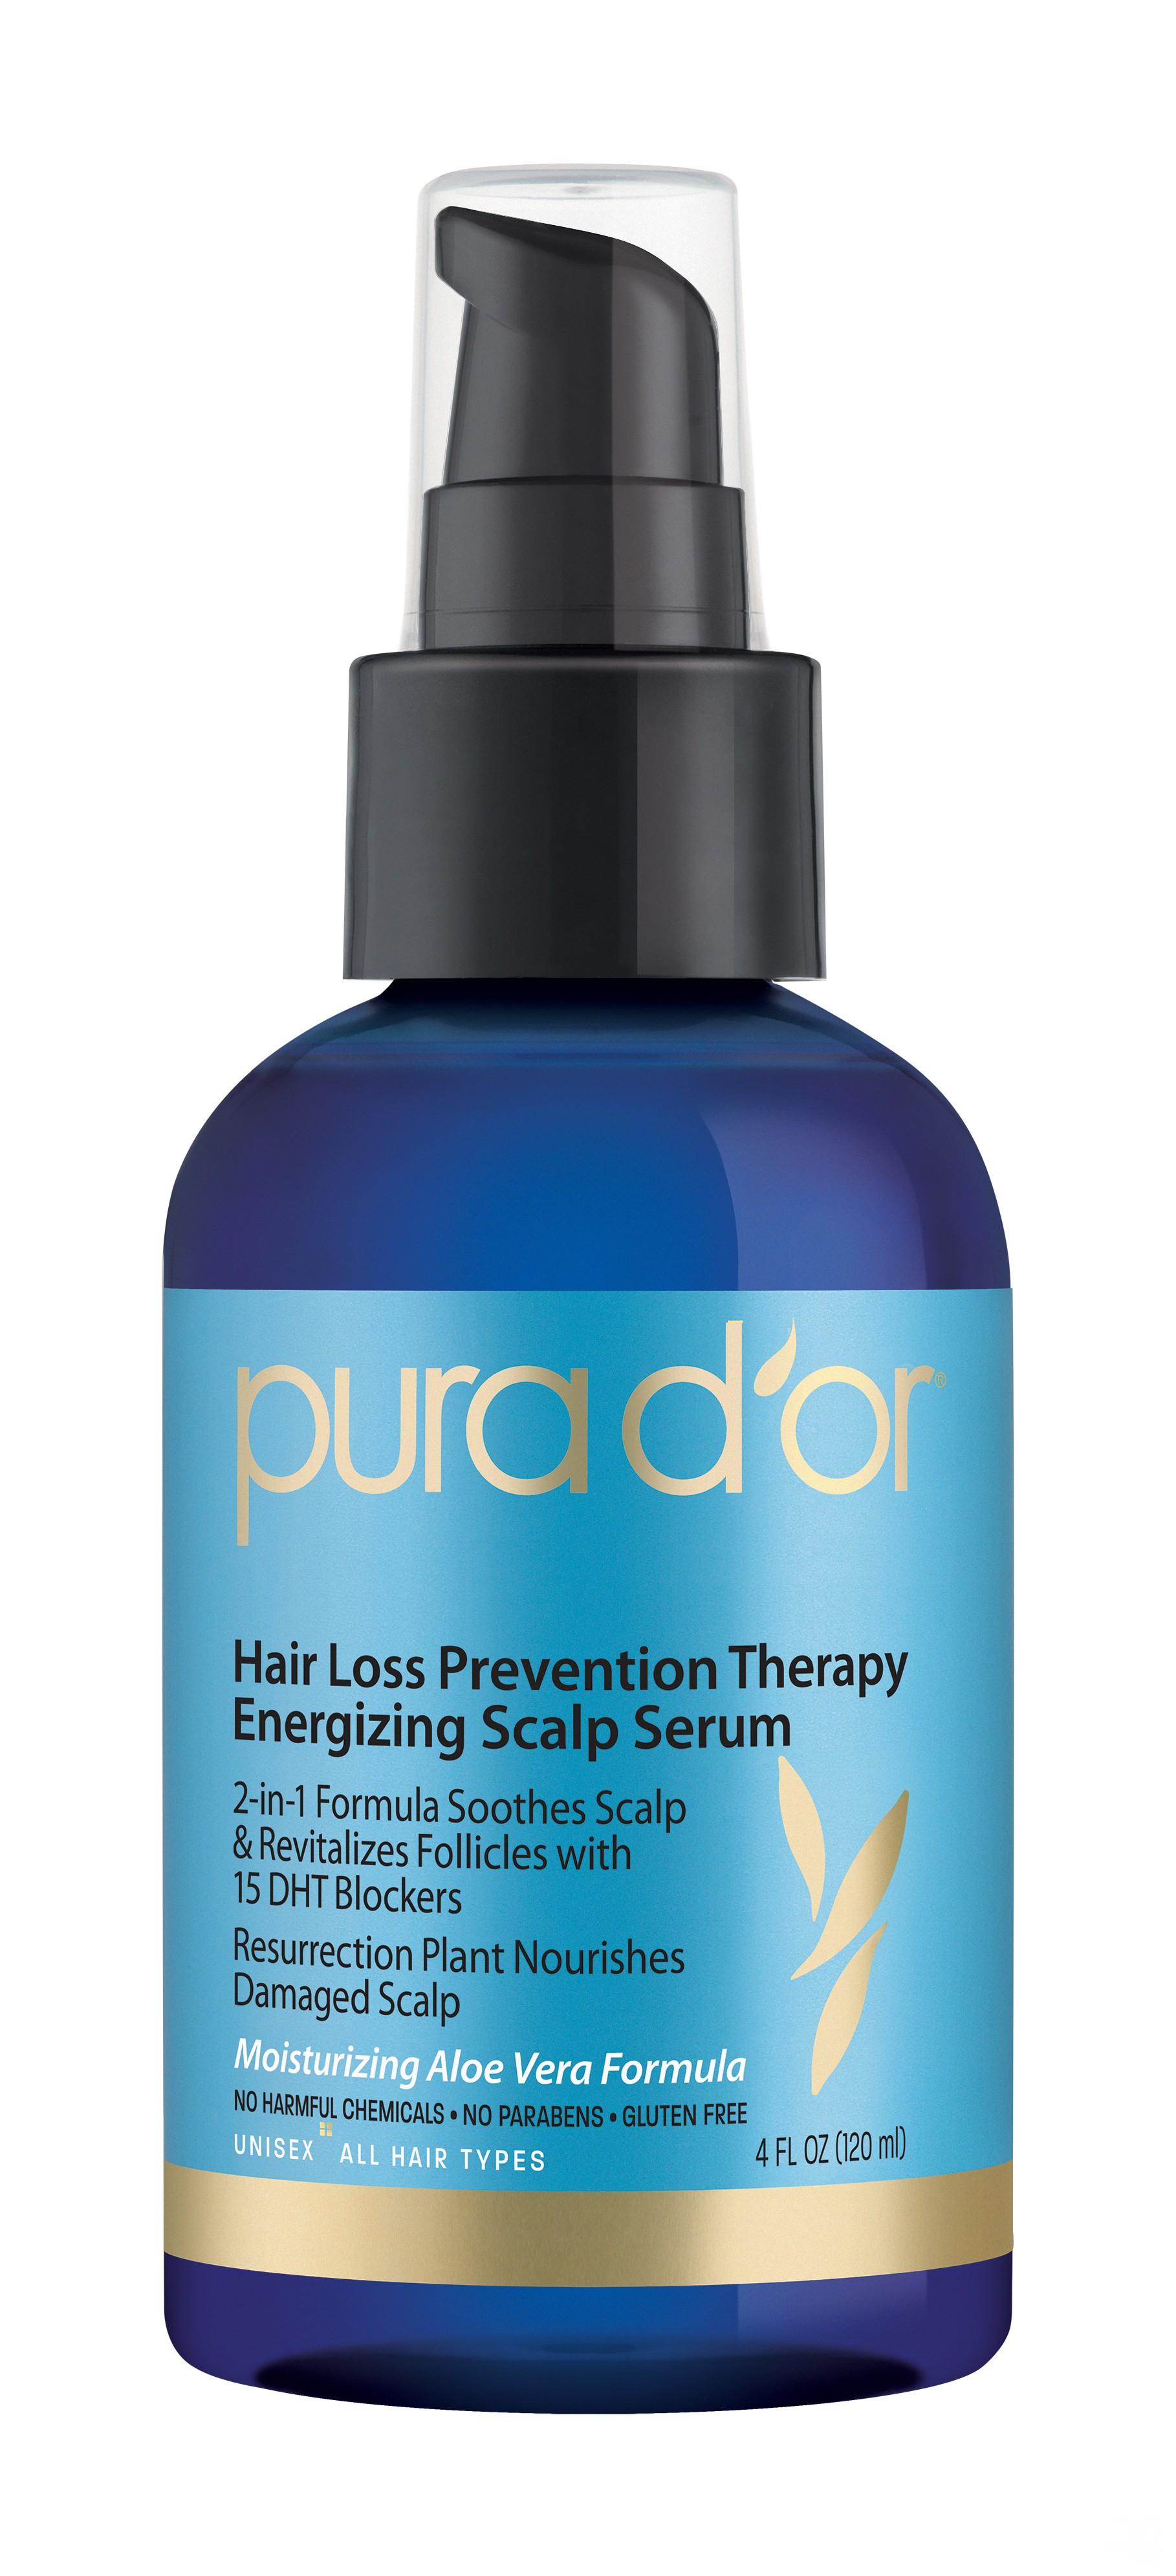 Energizing Scalp Serum